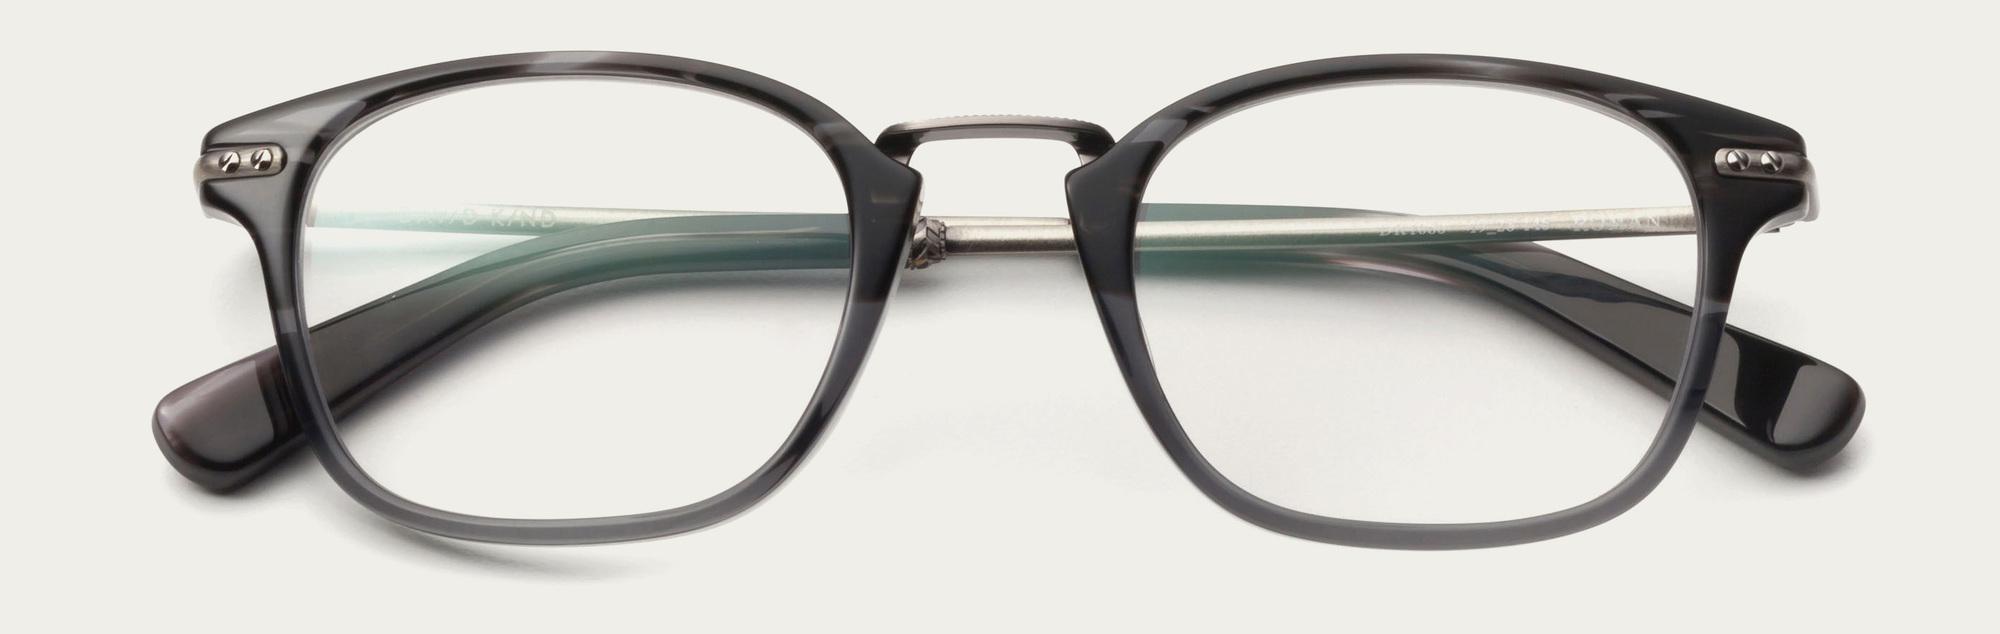 The Officially Official Eyewear Thread- | Styleforum